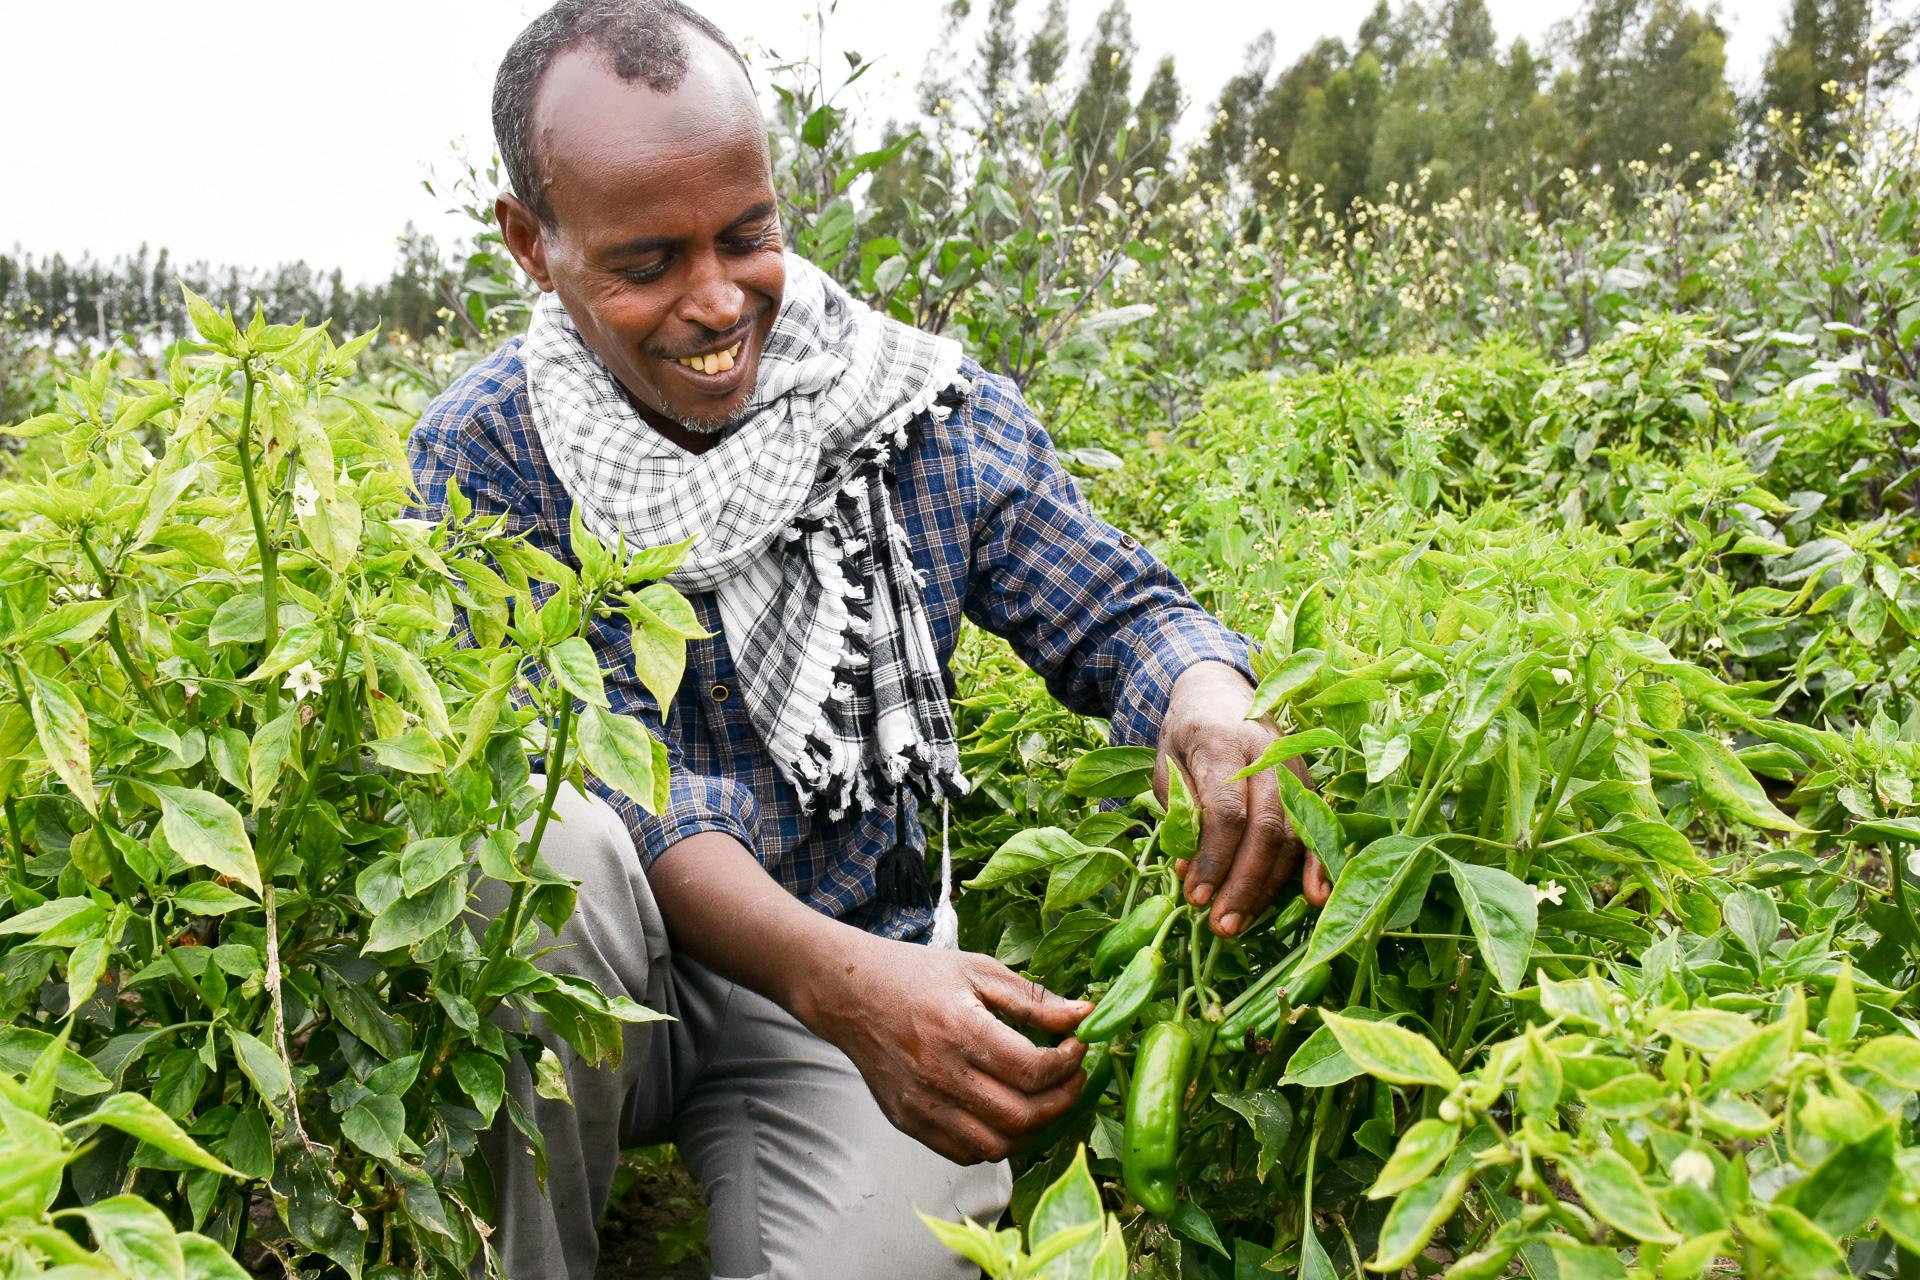 Temam Mama checks his crops. (Photo: Simret Yasabu/CIMMYT)